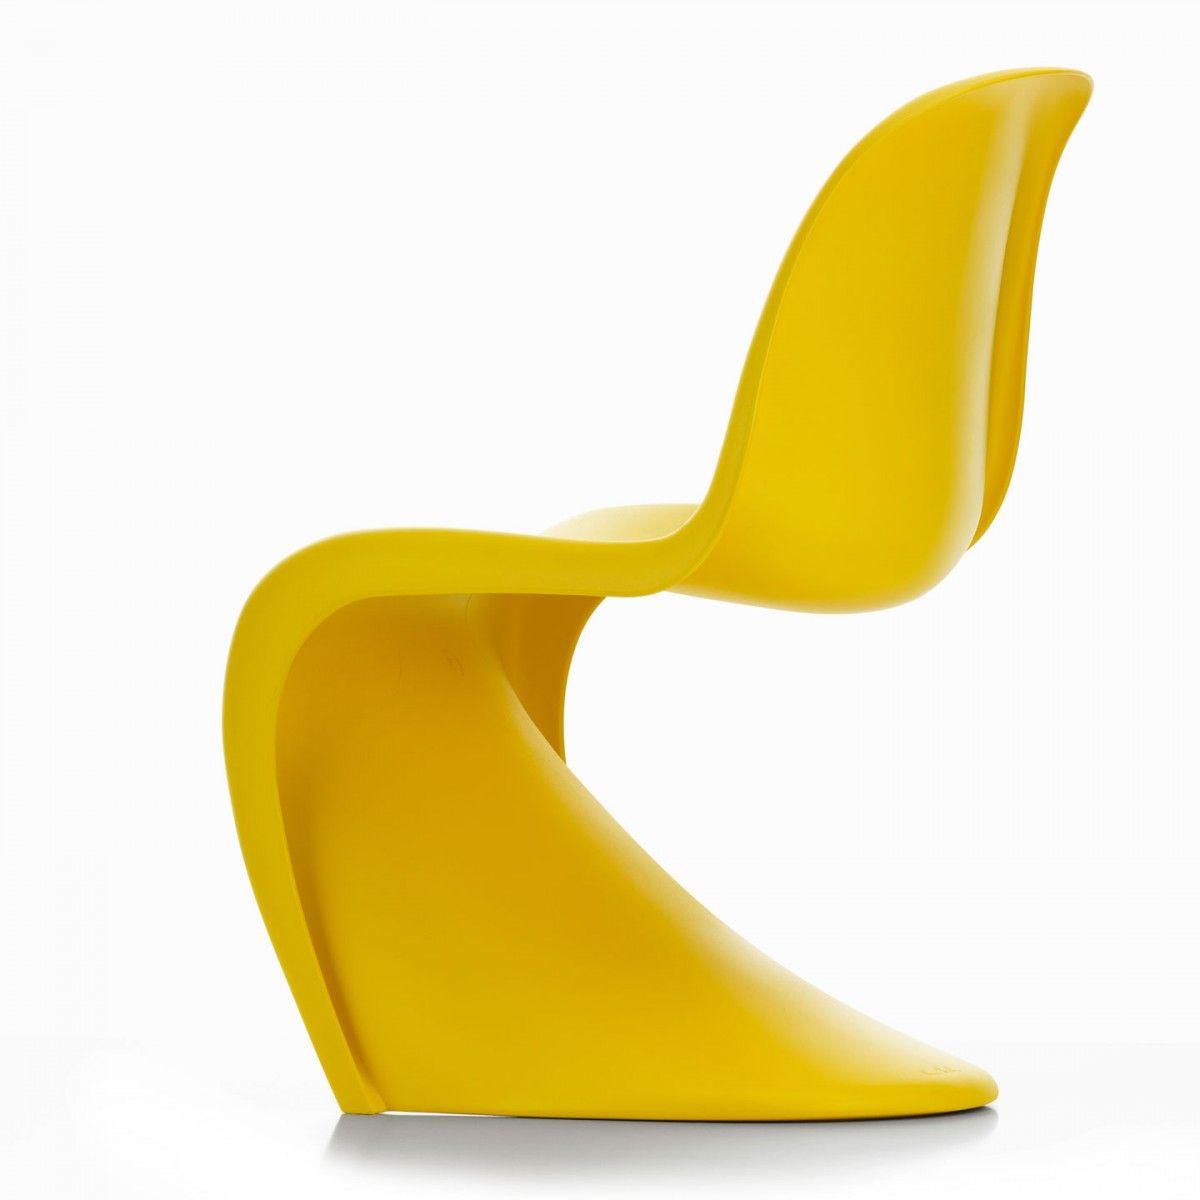 Kinder Egg Chair.Vitra Panton Chair Weiss Vitra Panton Chair Aanbieding Panton Stuhl